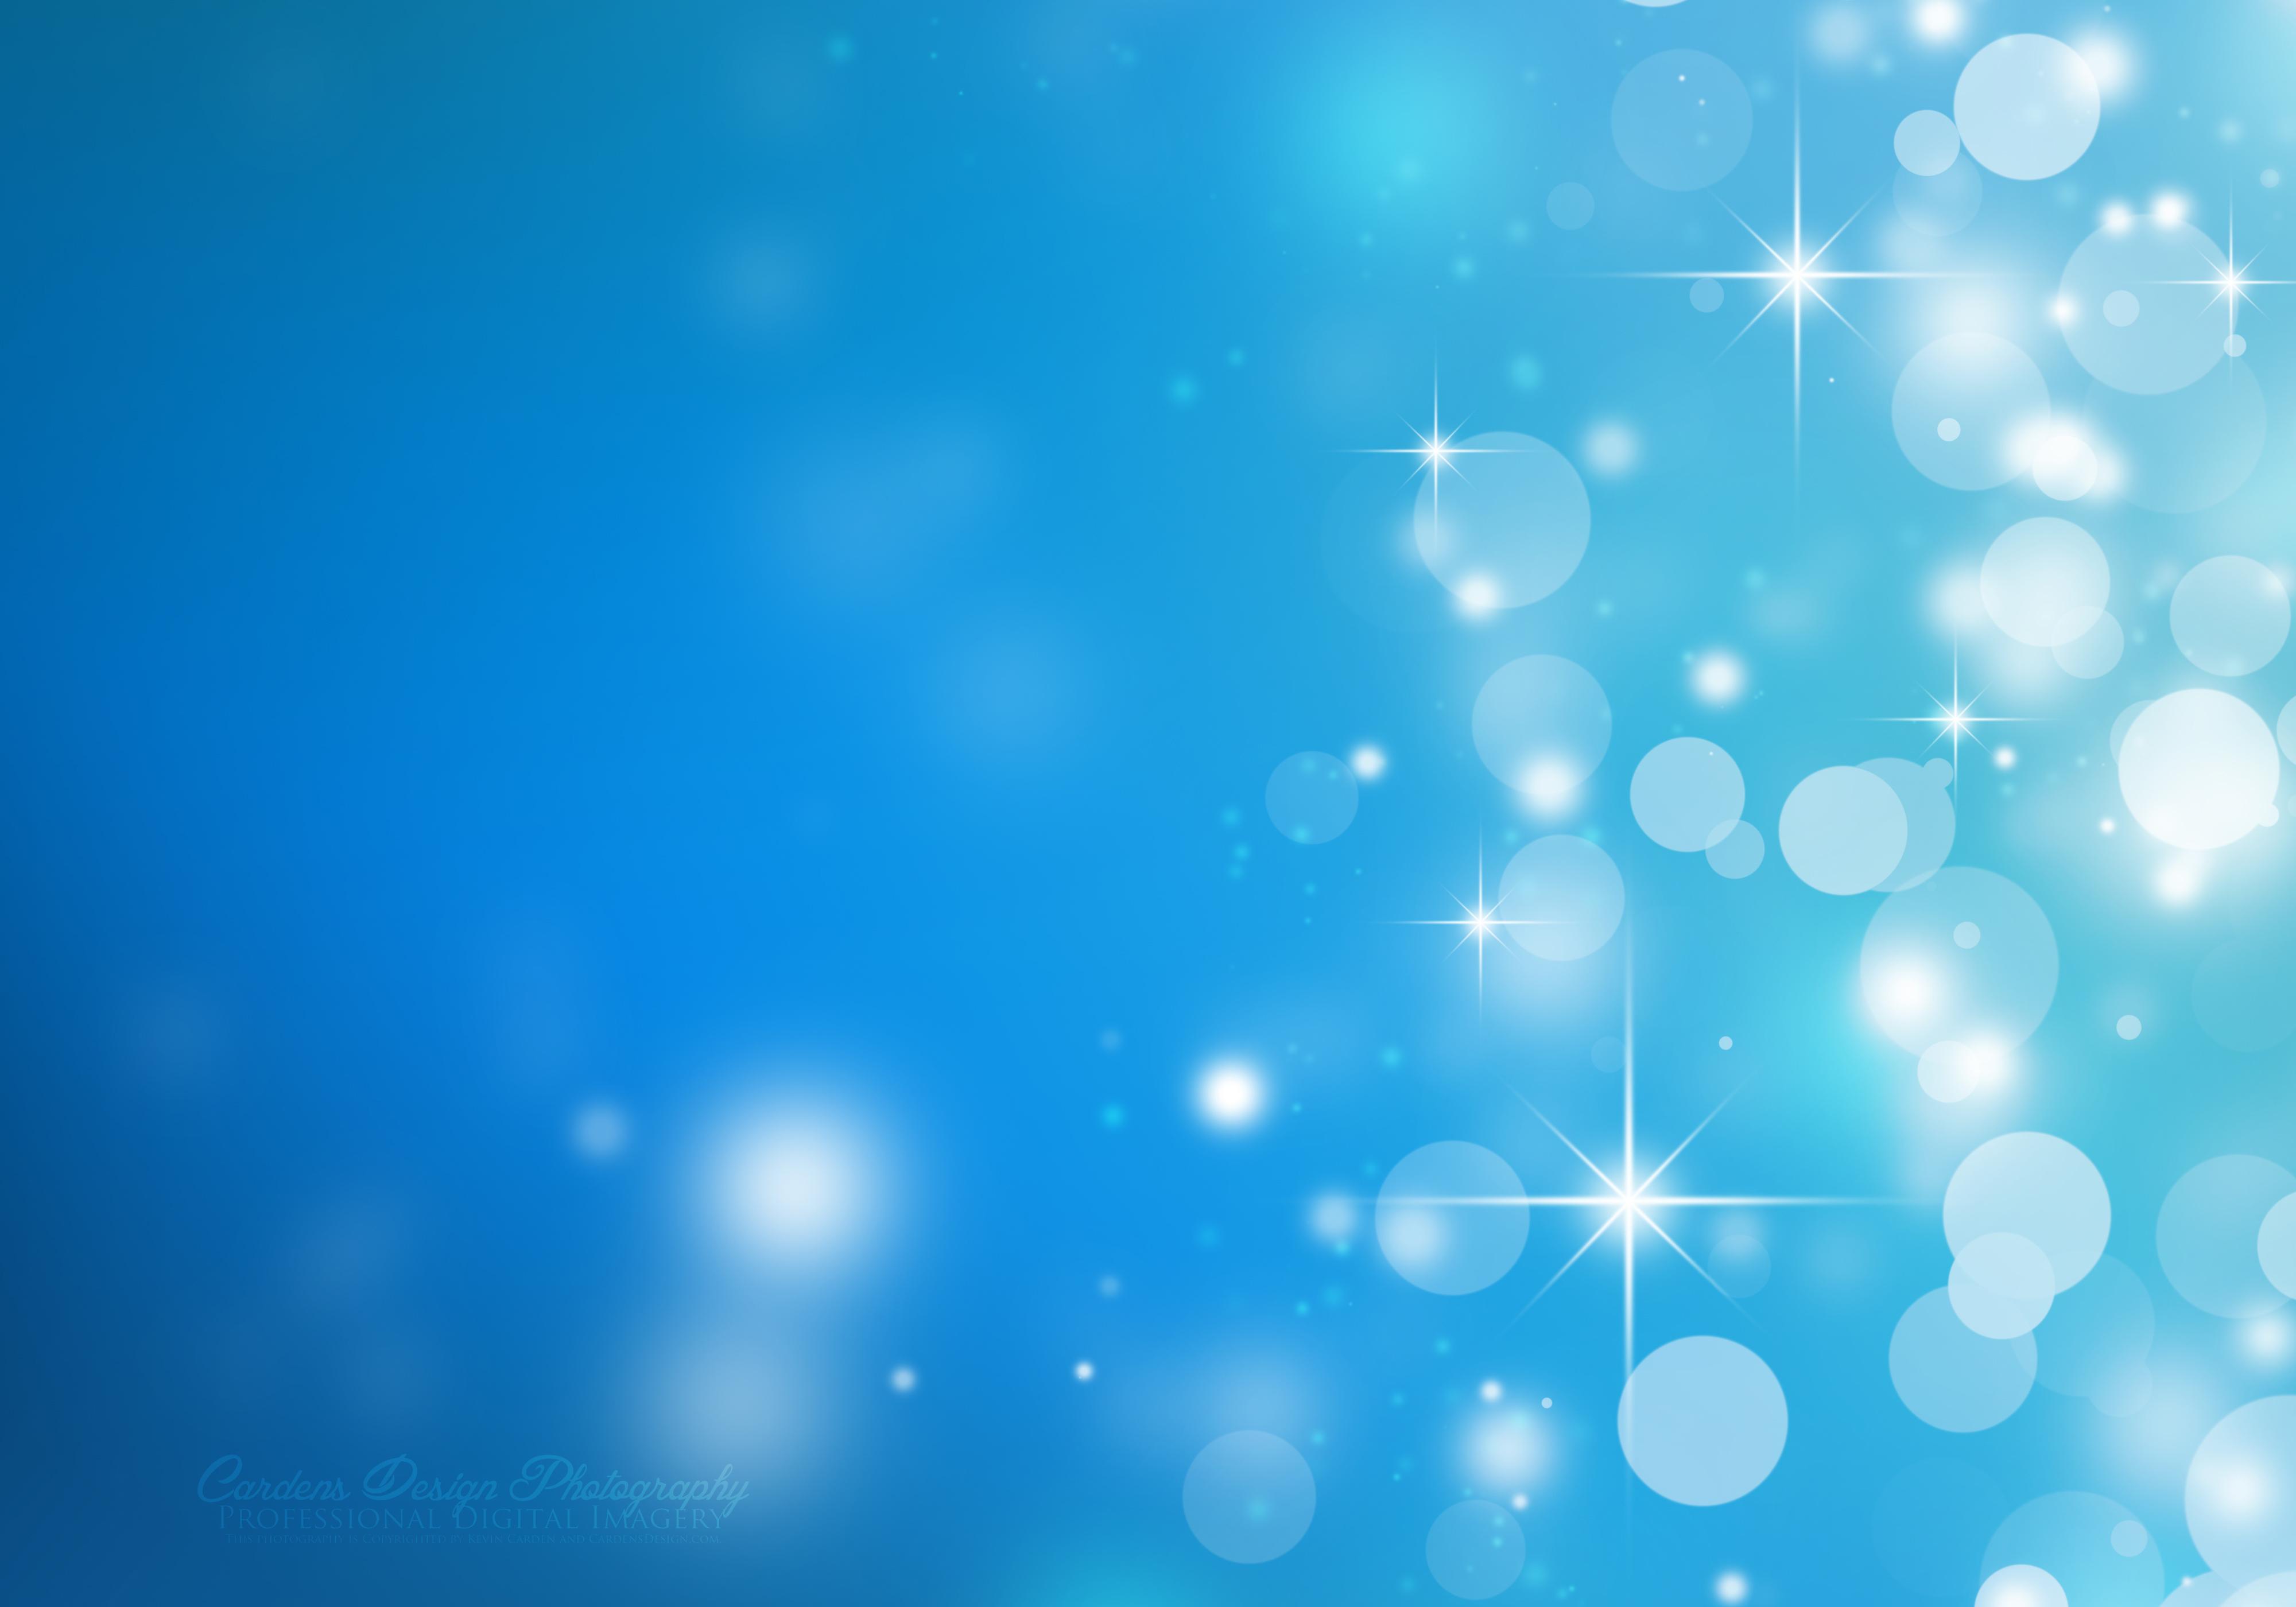 Tags-blue-lights-shiny-background-desktop-wallpaper-orbs ...